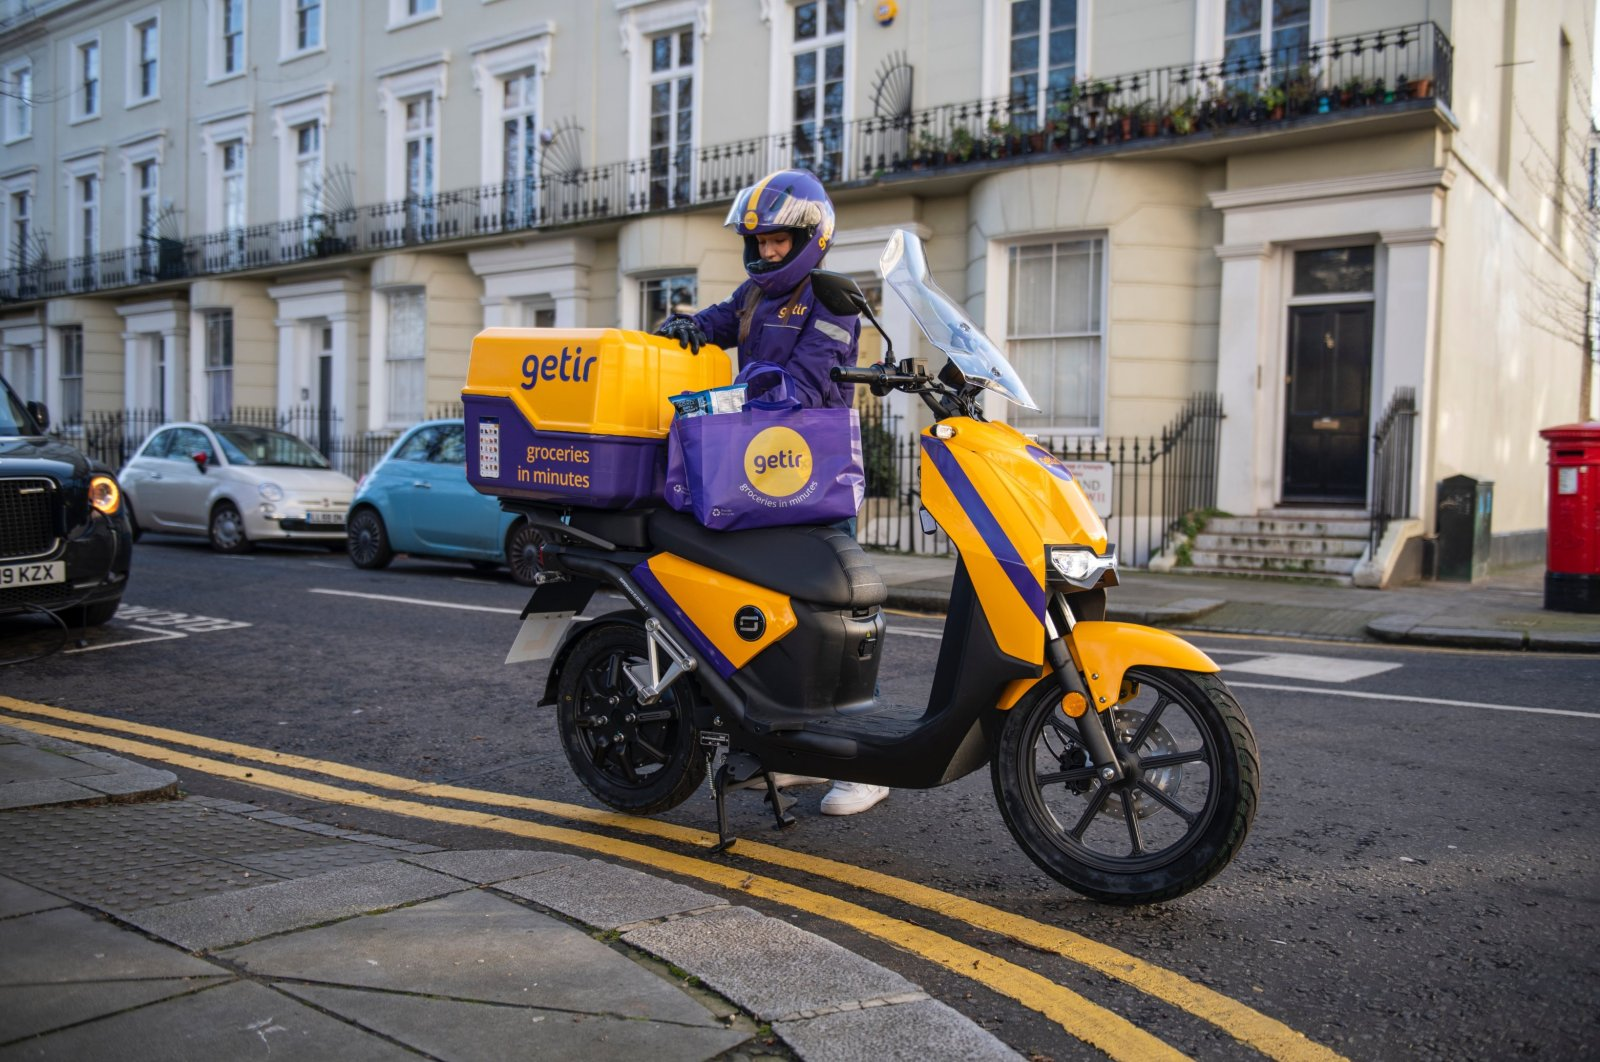 A Getir delivery person is seen beside his bike, London, U.K., Jan. 27, 2021. (Photo Courtesy of Getir)